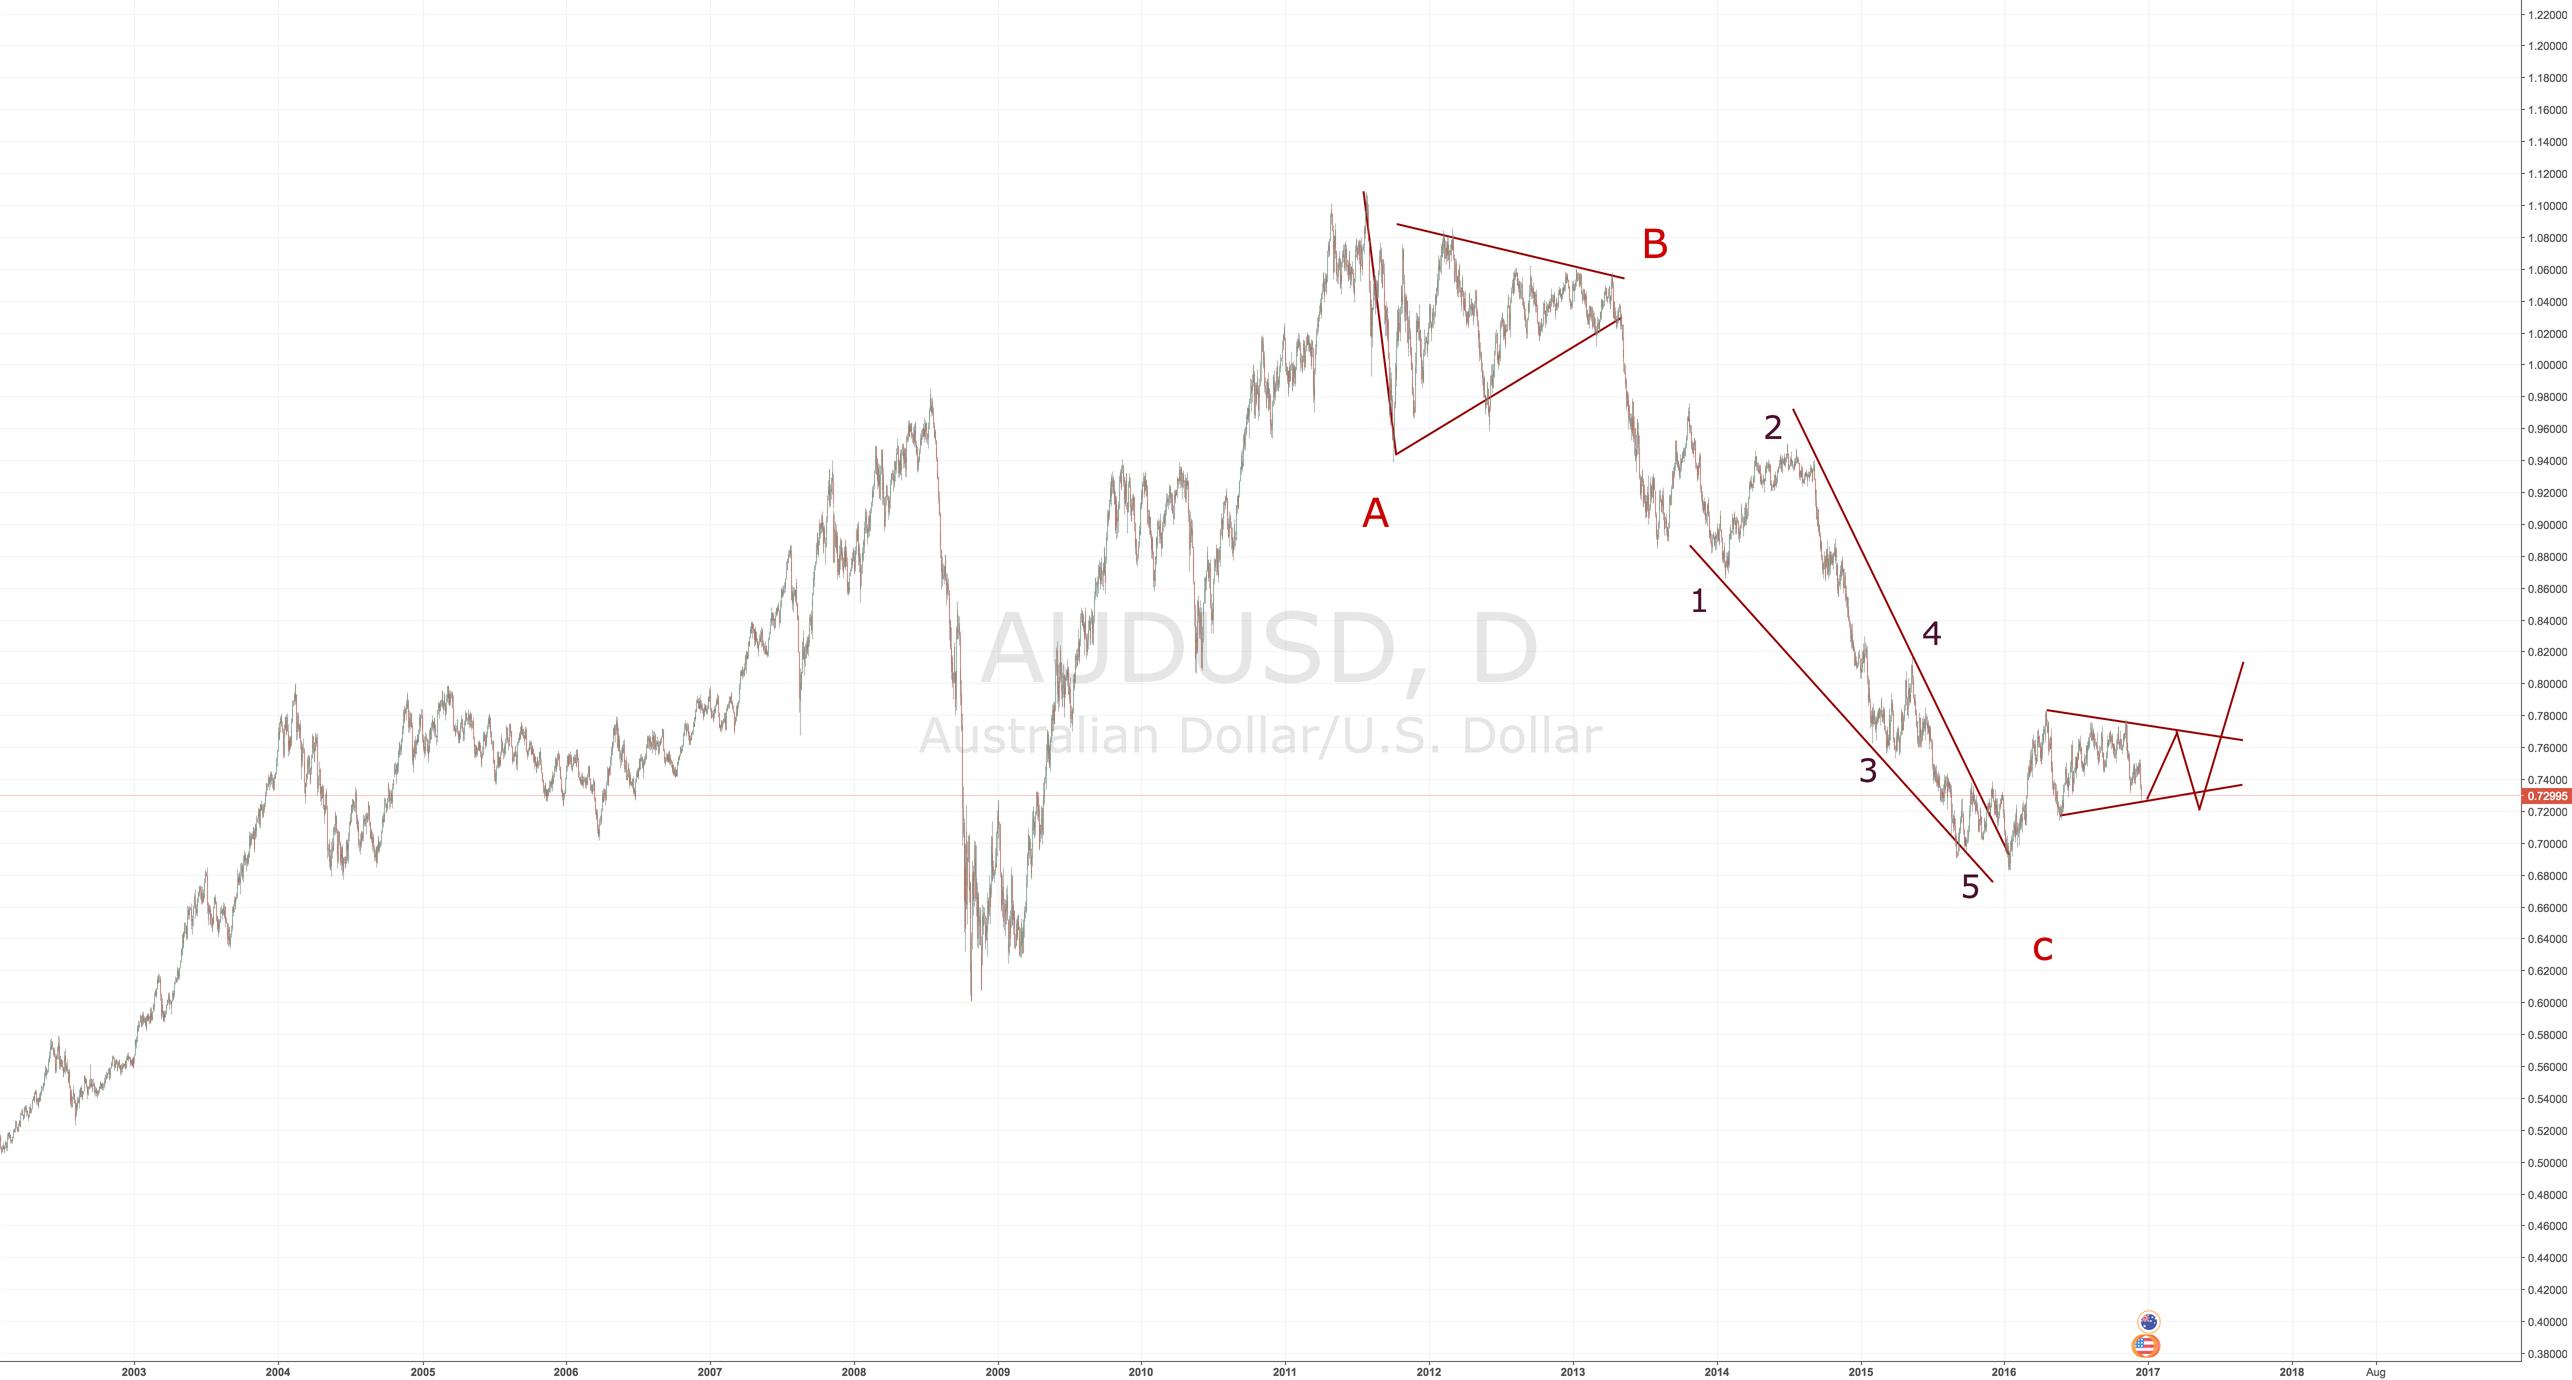 FX:AUD/USD long